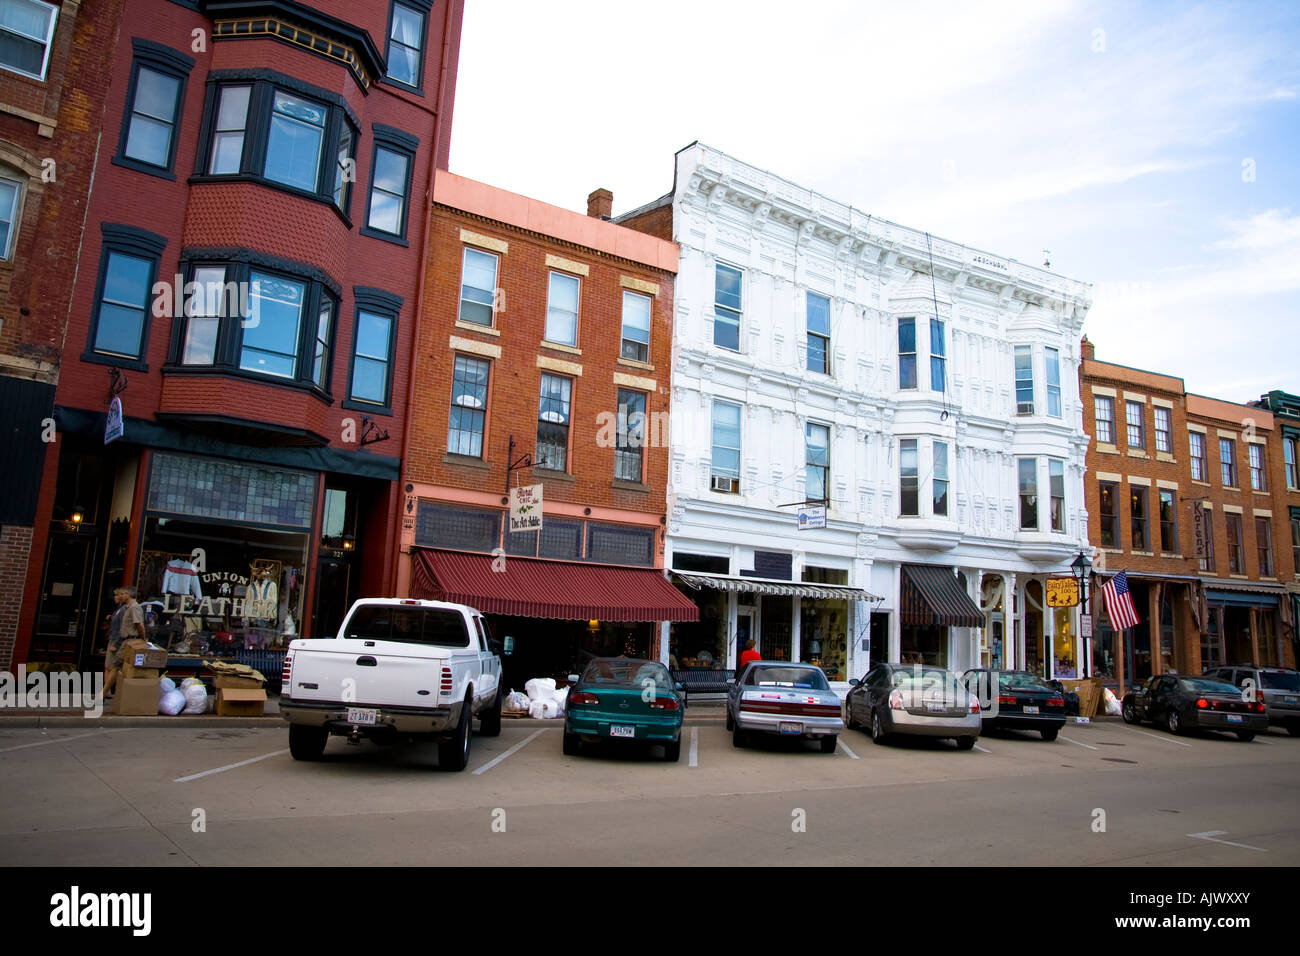 Galena Illinois Main Street Shops Restaurants Stock Photo 14820386